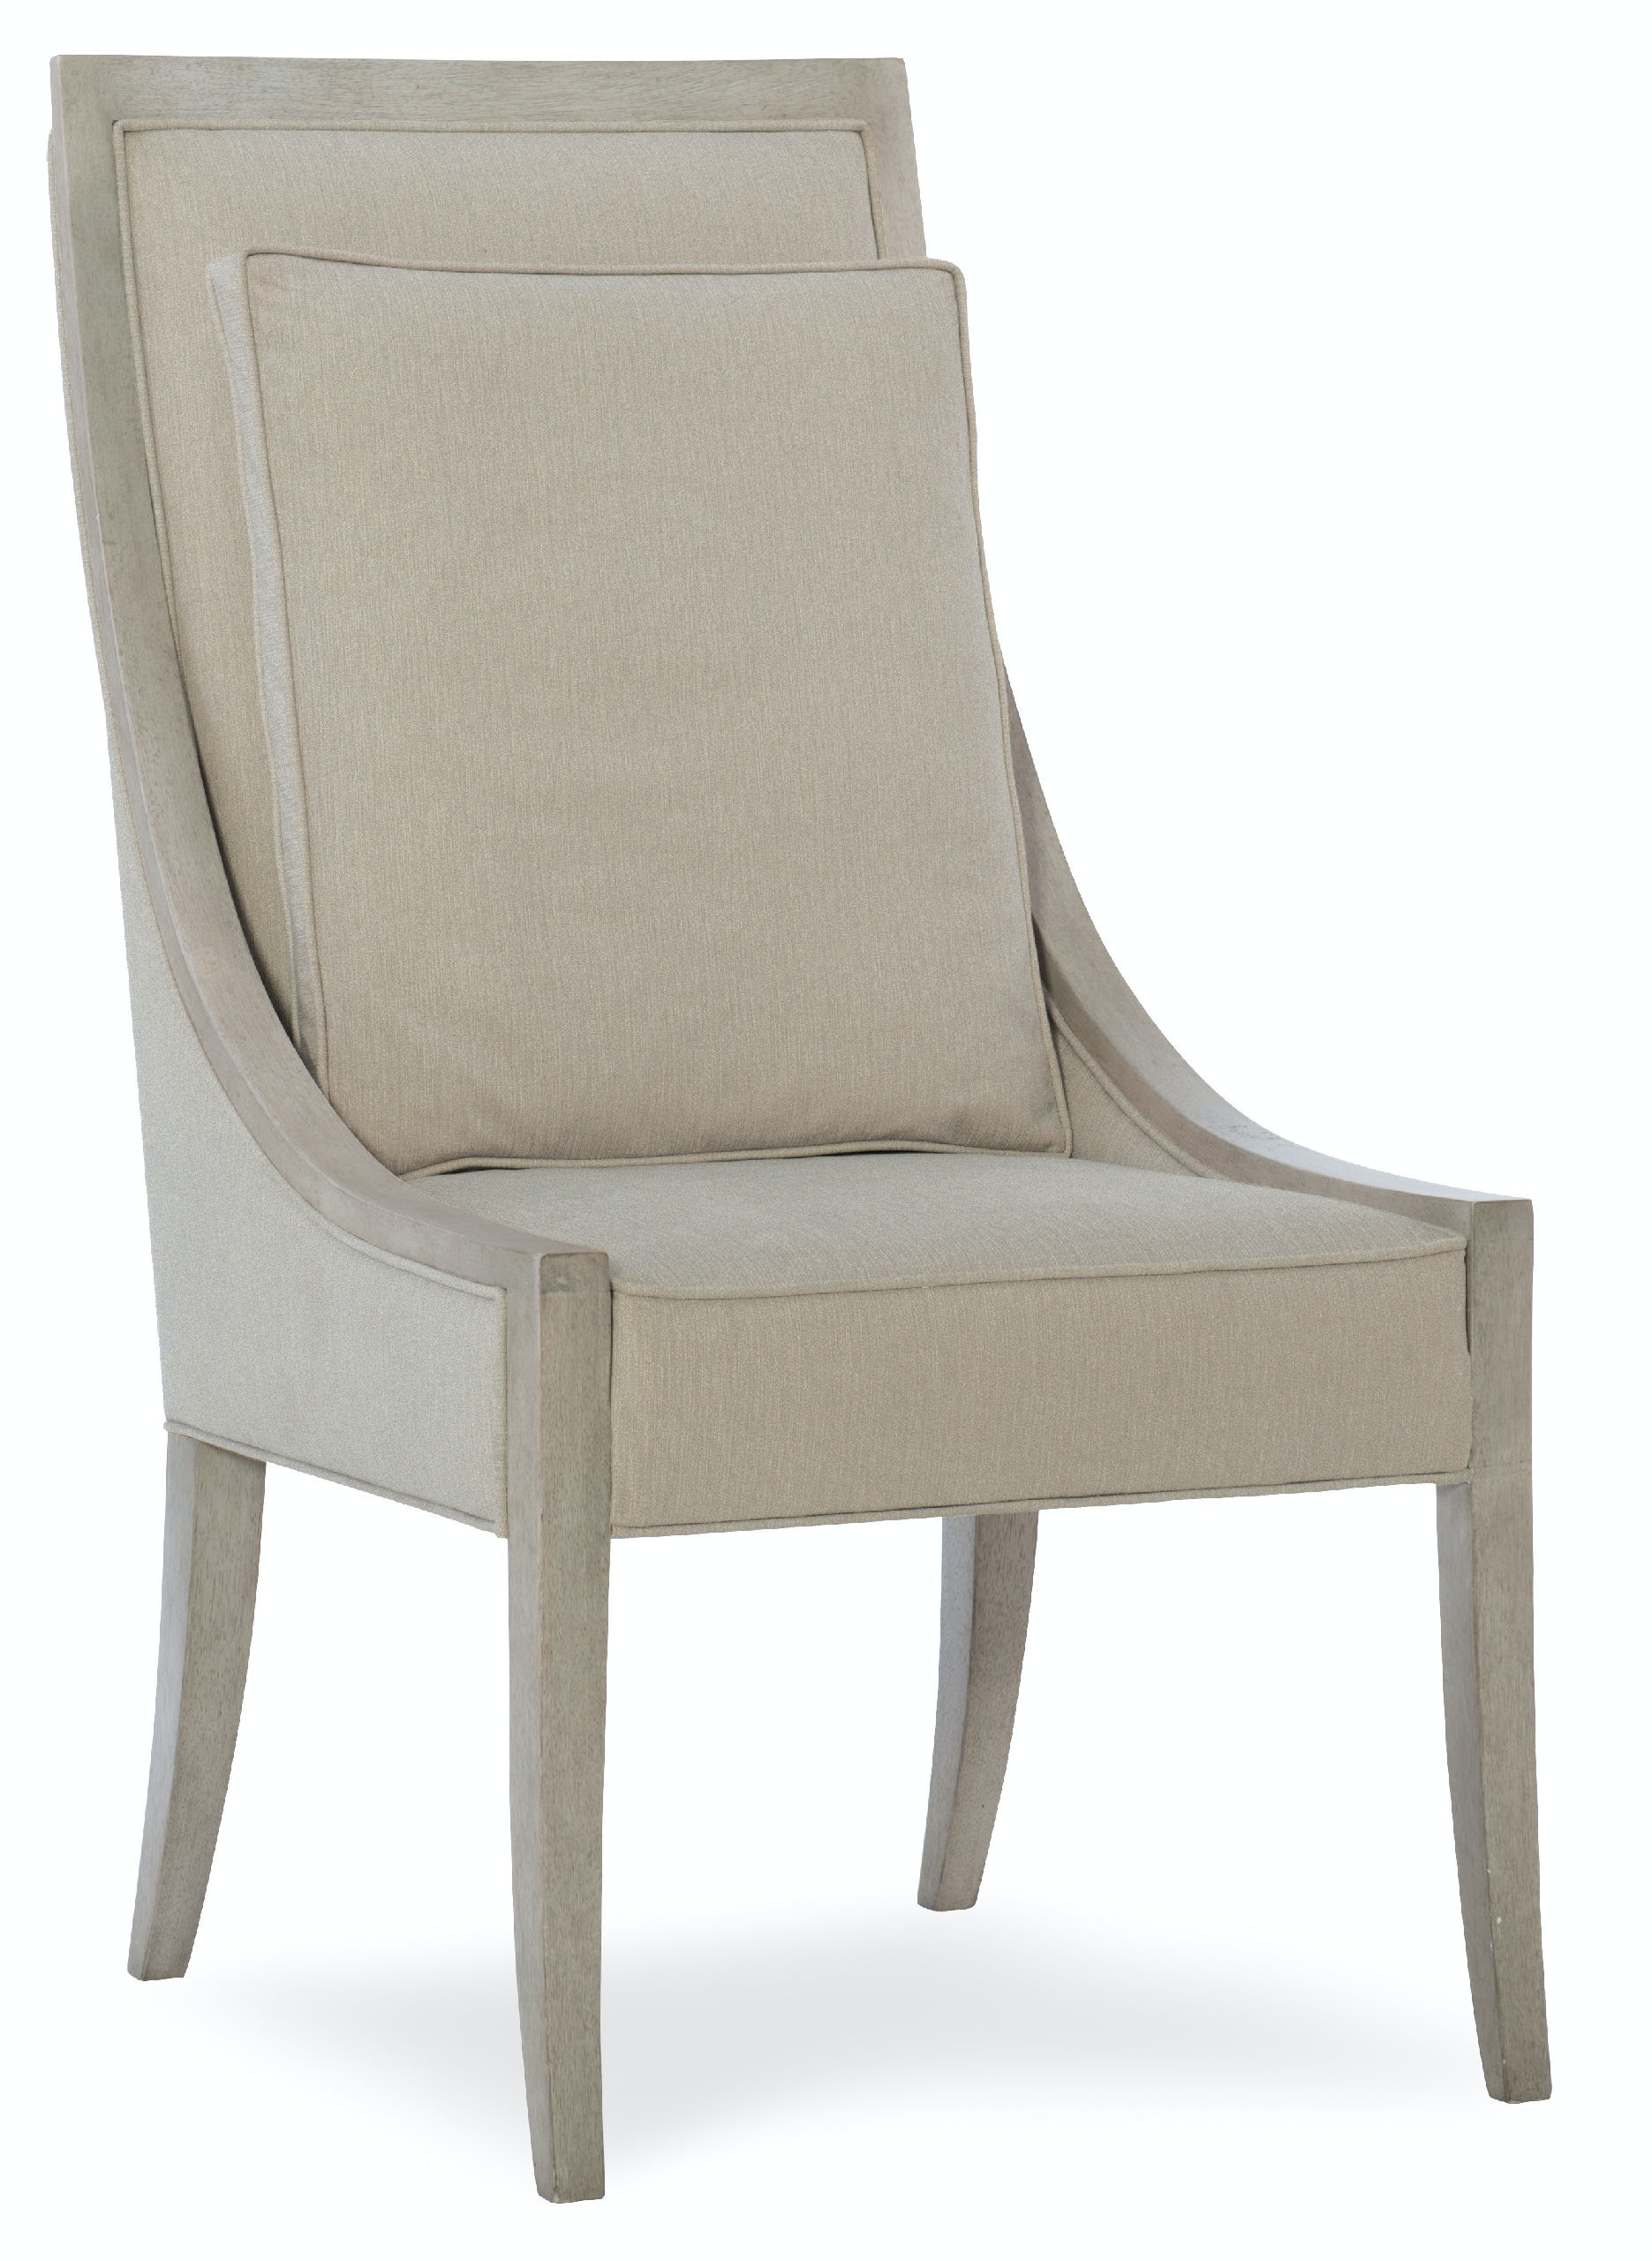 hooker furniture dining room elixir host chair 5990 75500 ltwd rh louisshanksfurniture com Best San Antonio Dining Market Square San Antonio